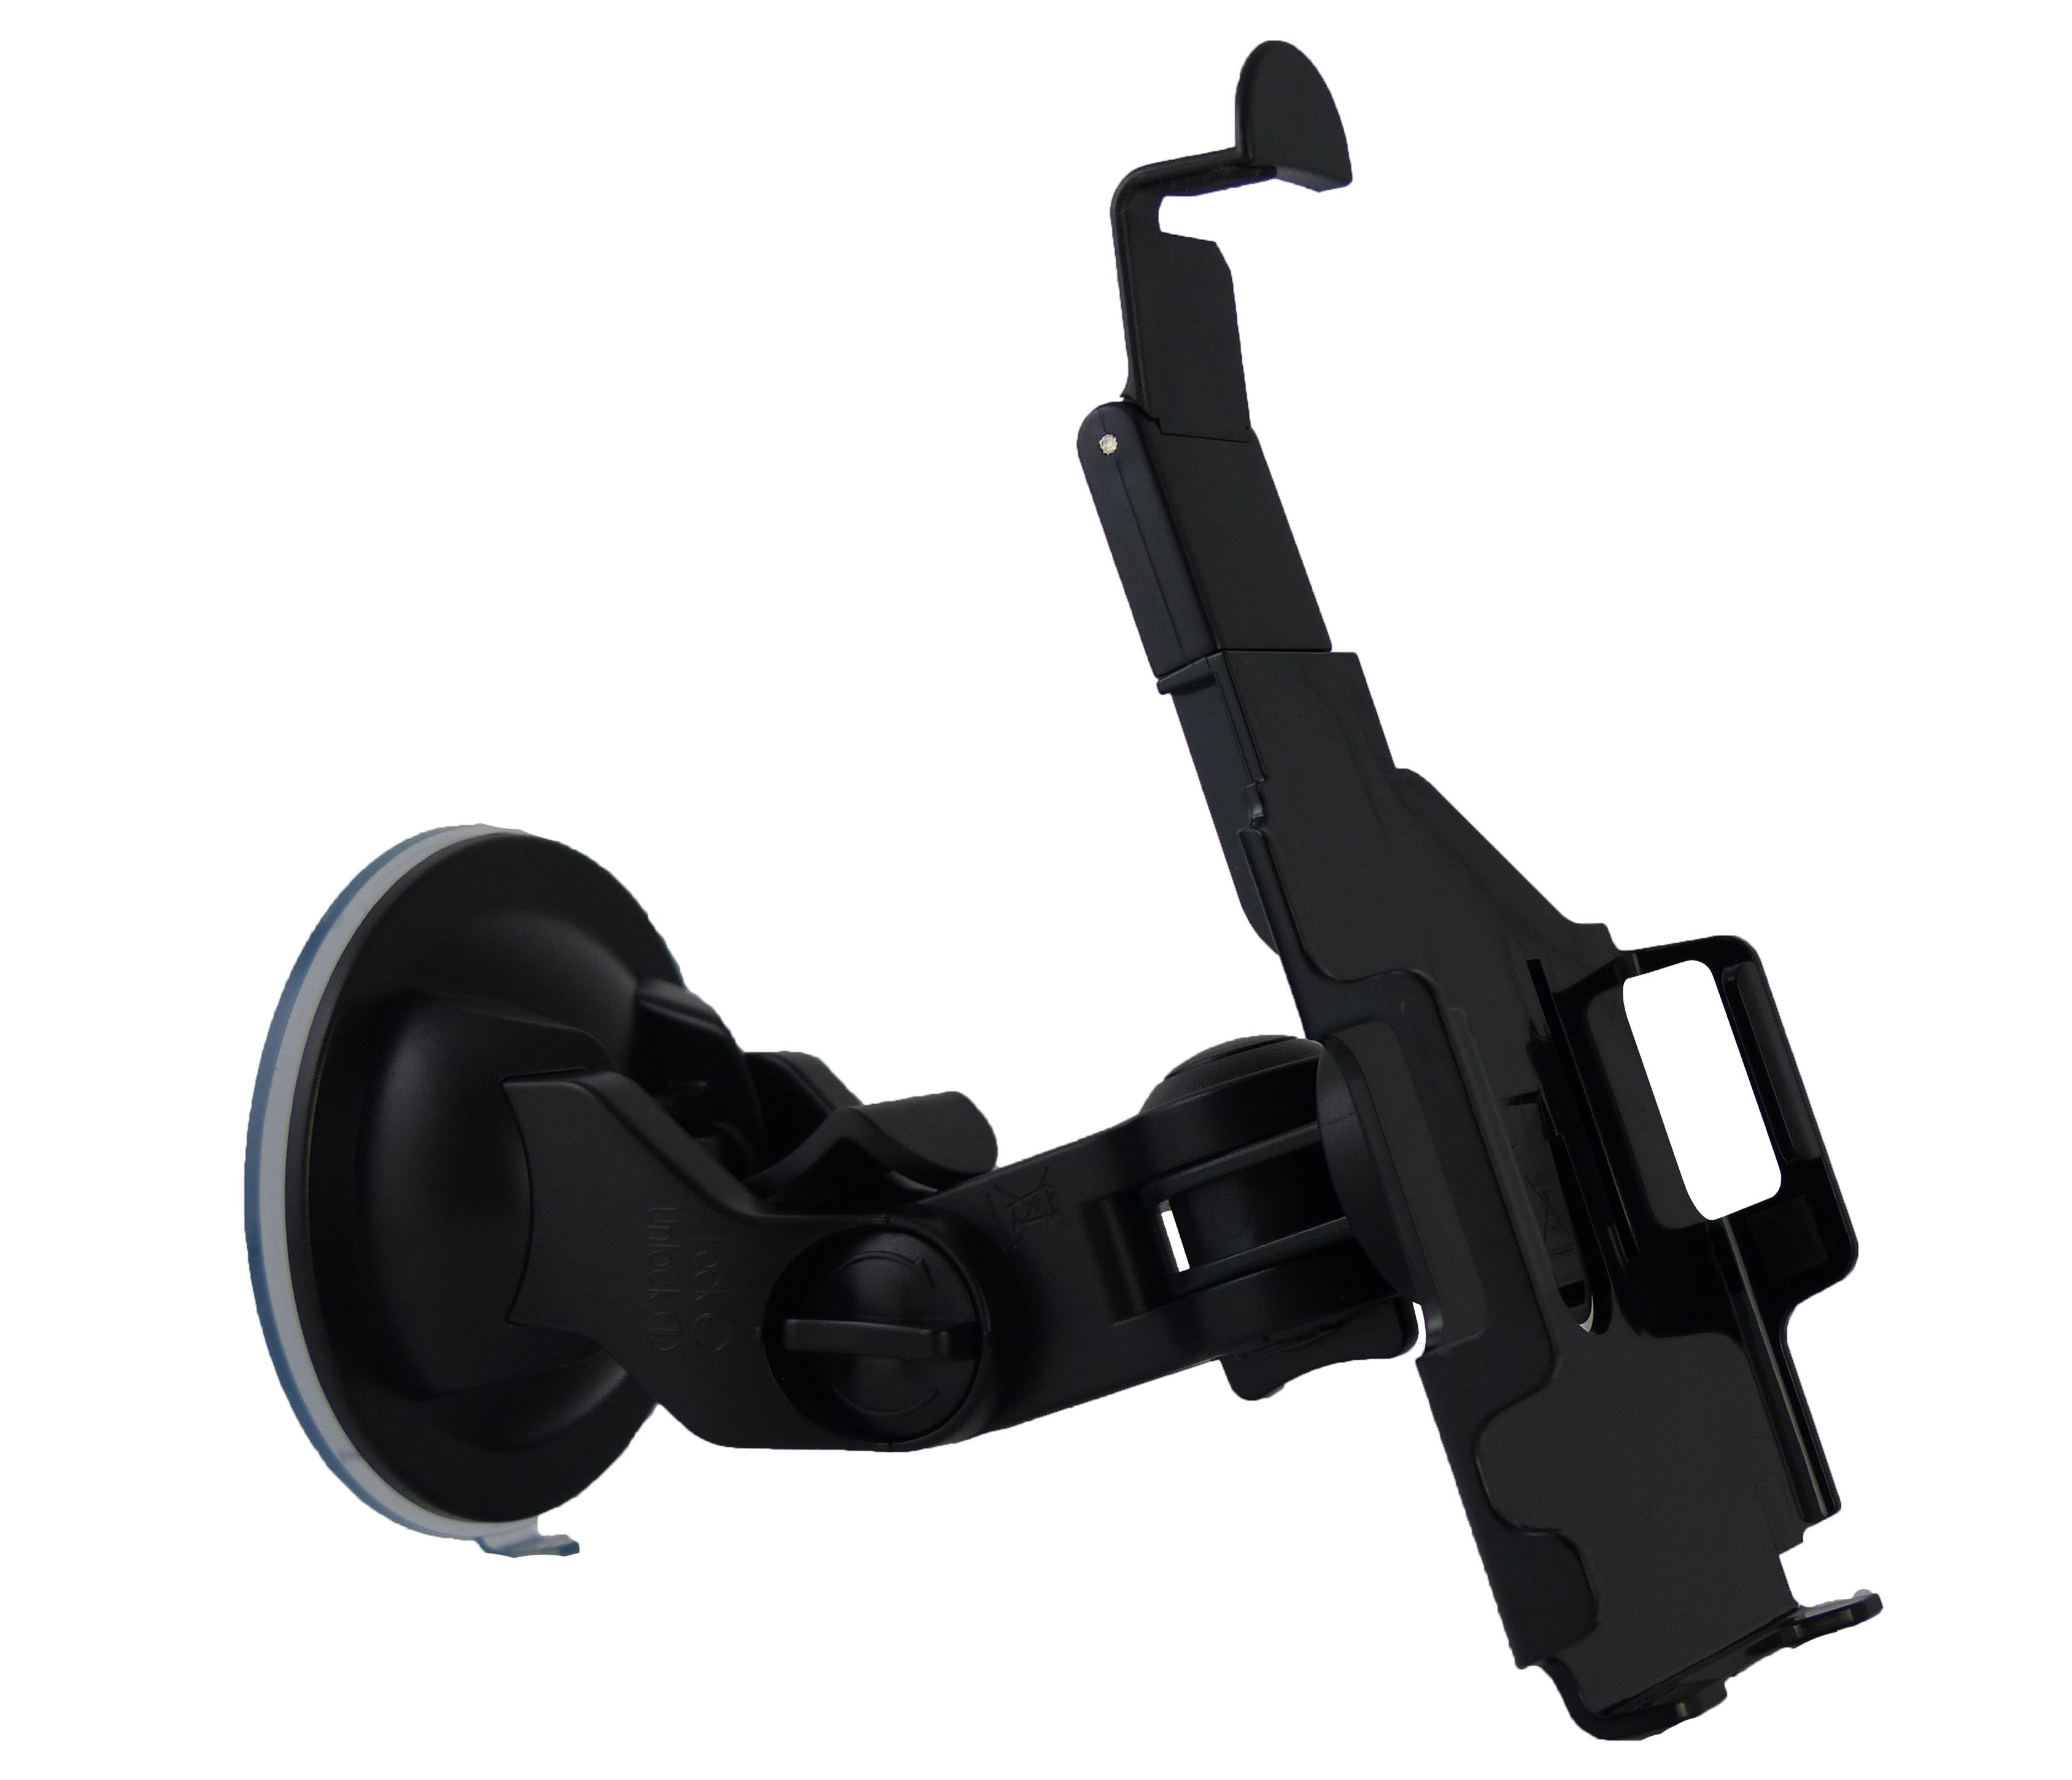 haicom kfz autohalterung f r samsung galaxy s6 active f r. Black Bedroom Furniture Sets. Home Design Ideas